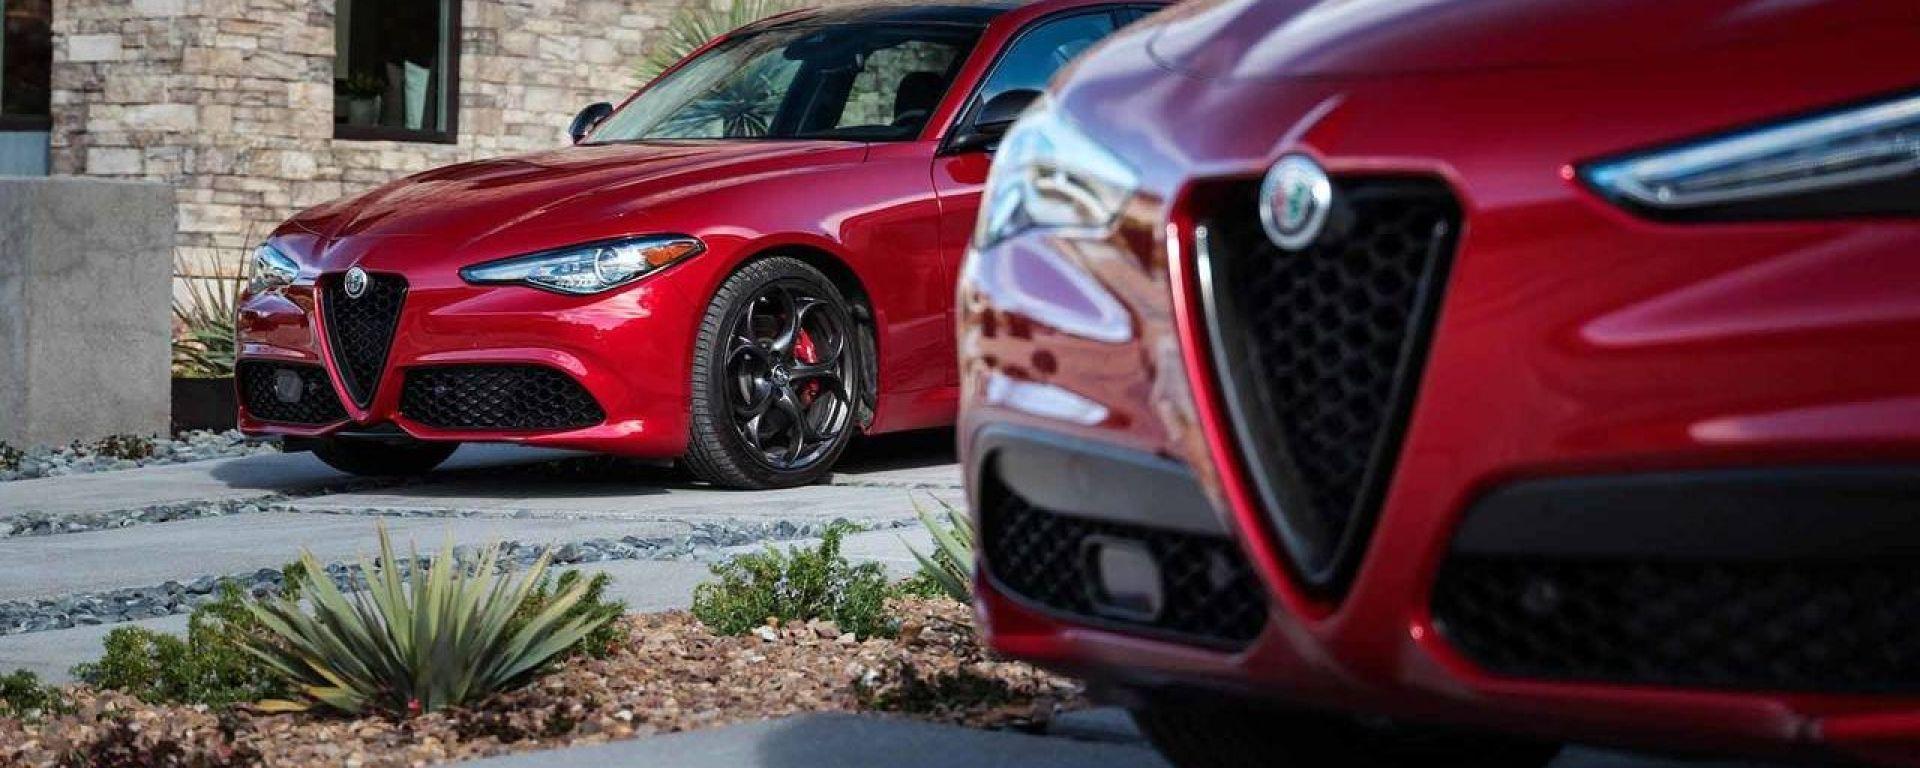 Alfa Romeo Giulia e Stelvio, niente ecotassa sui motori diesel